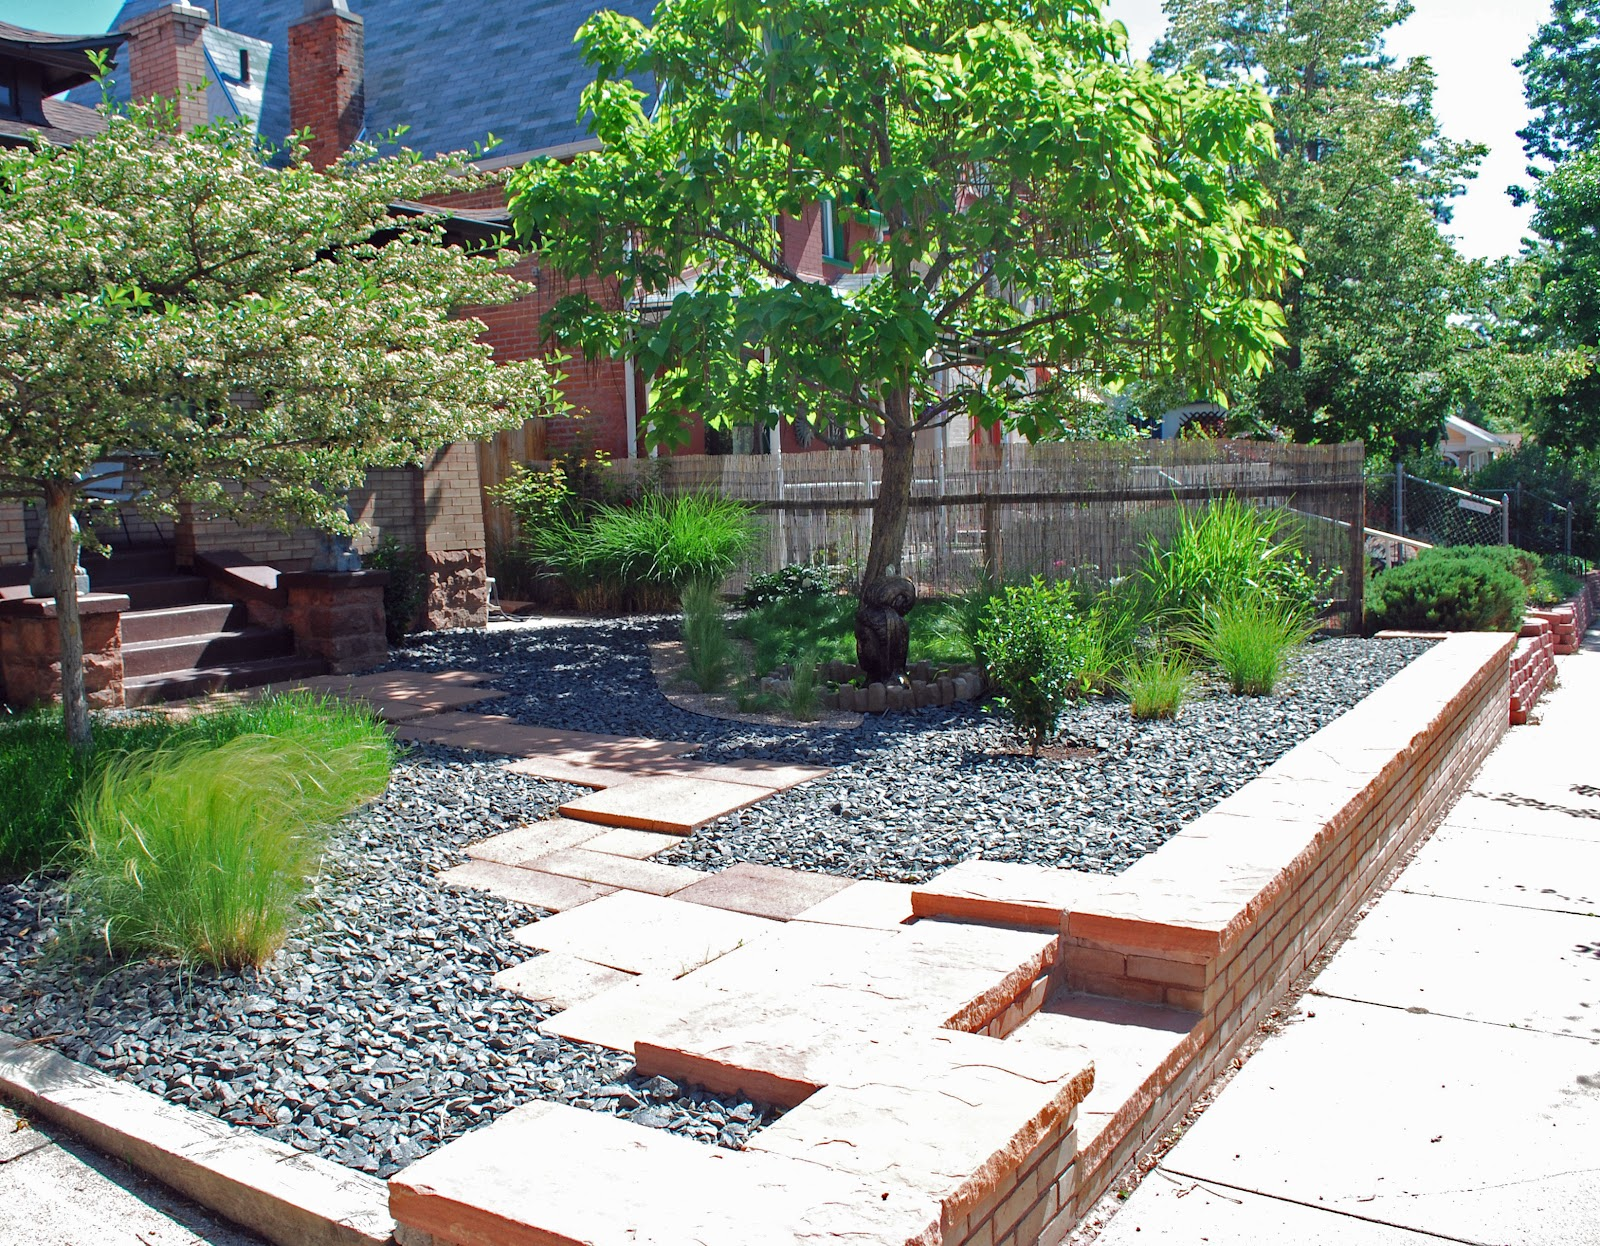 Landscape Design Focus: Low Maintenance | Garden Share Bristol on Low Maintenance Backyard  id=16310